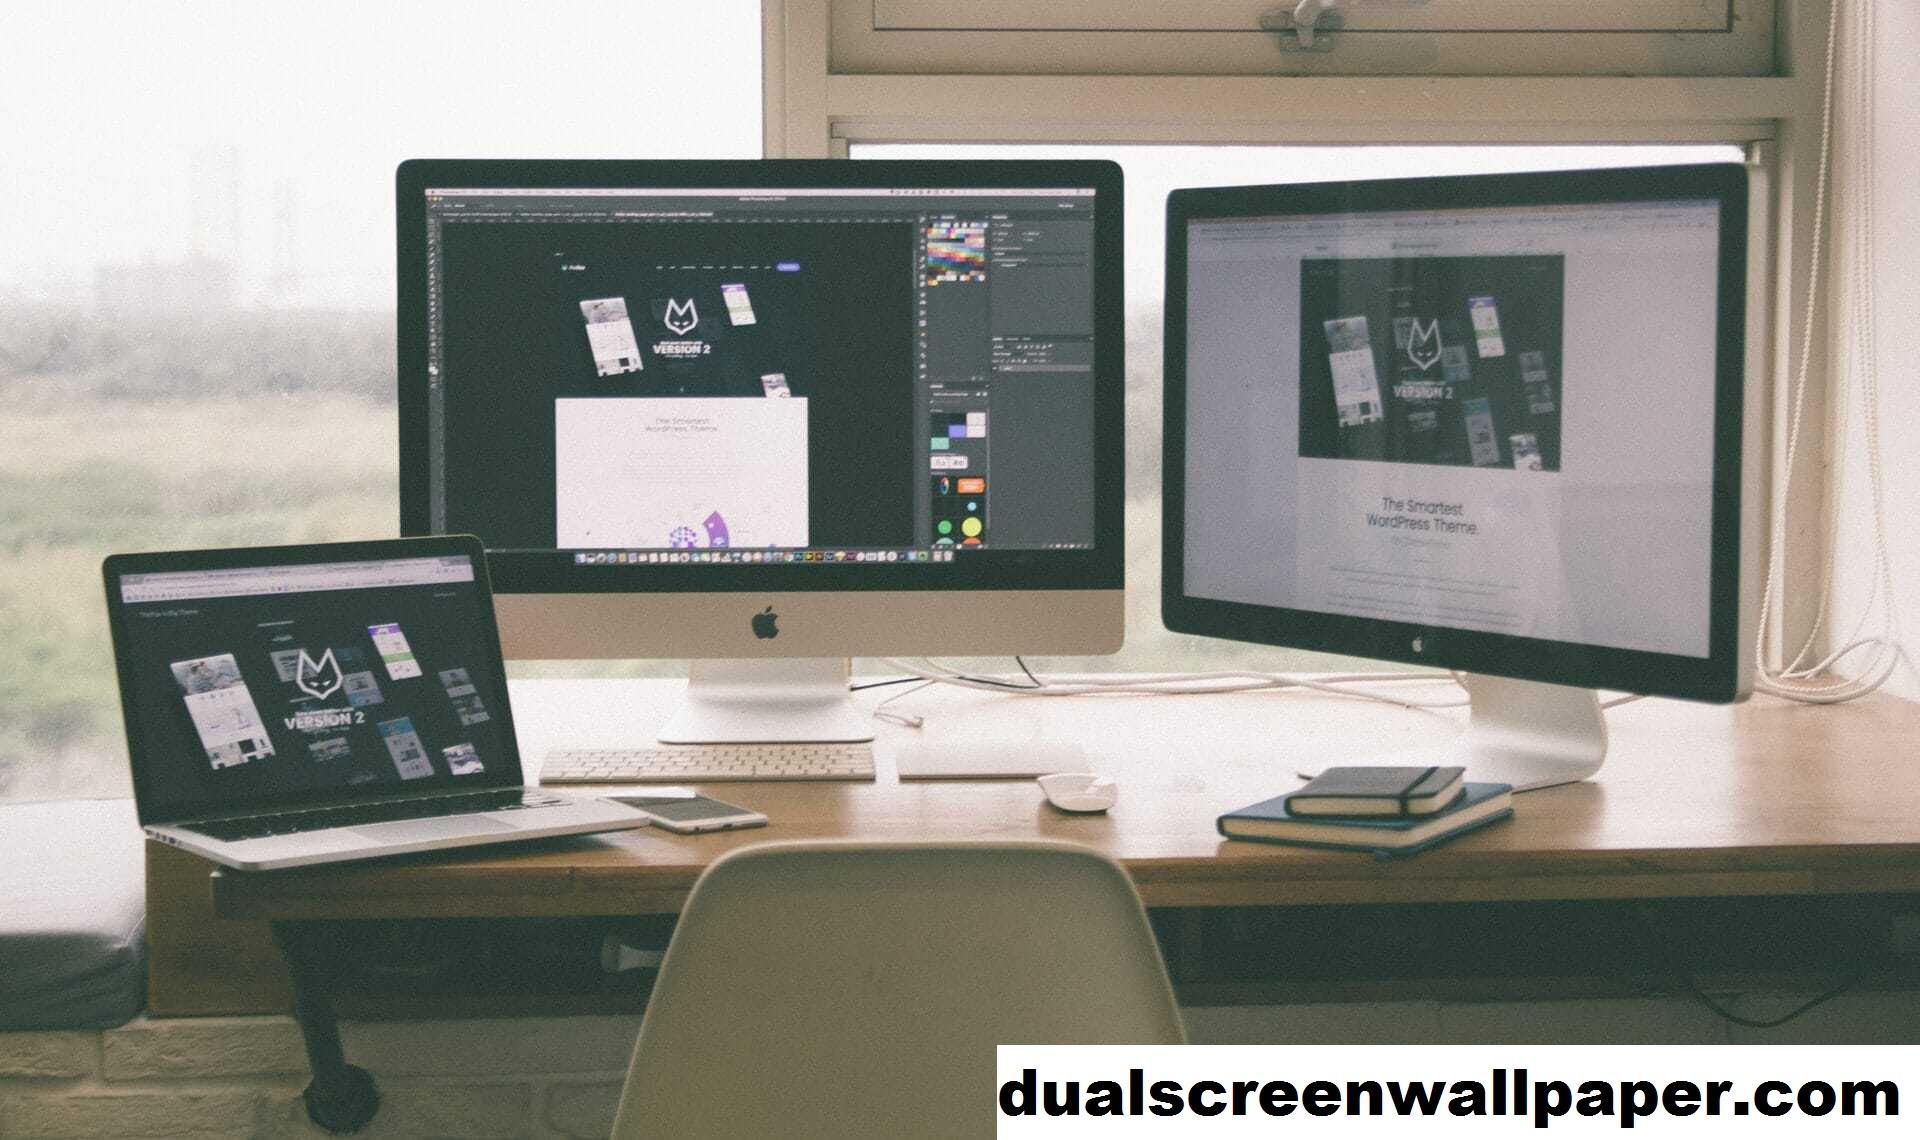 Membahas Tentang Manfaat Jika Kalian Memakai Dual Monitor